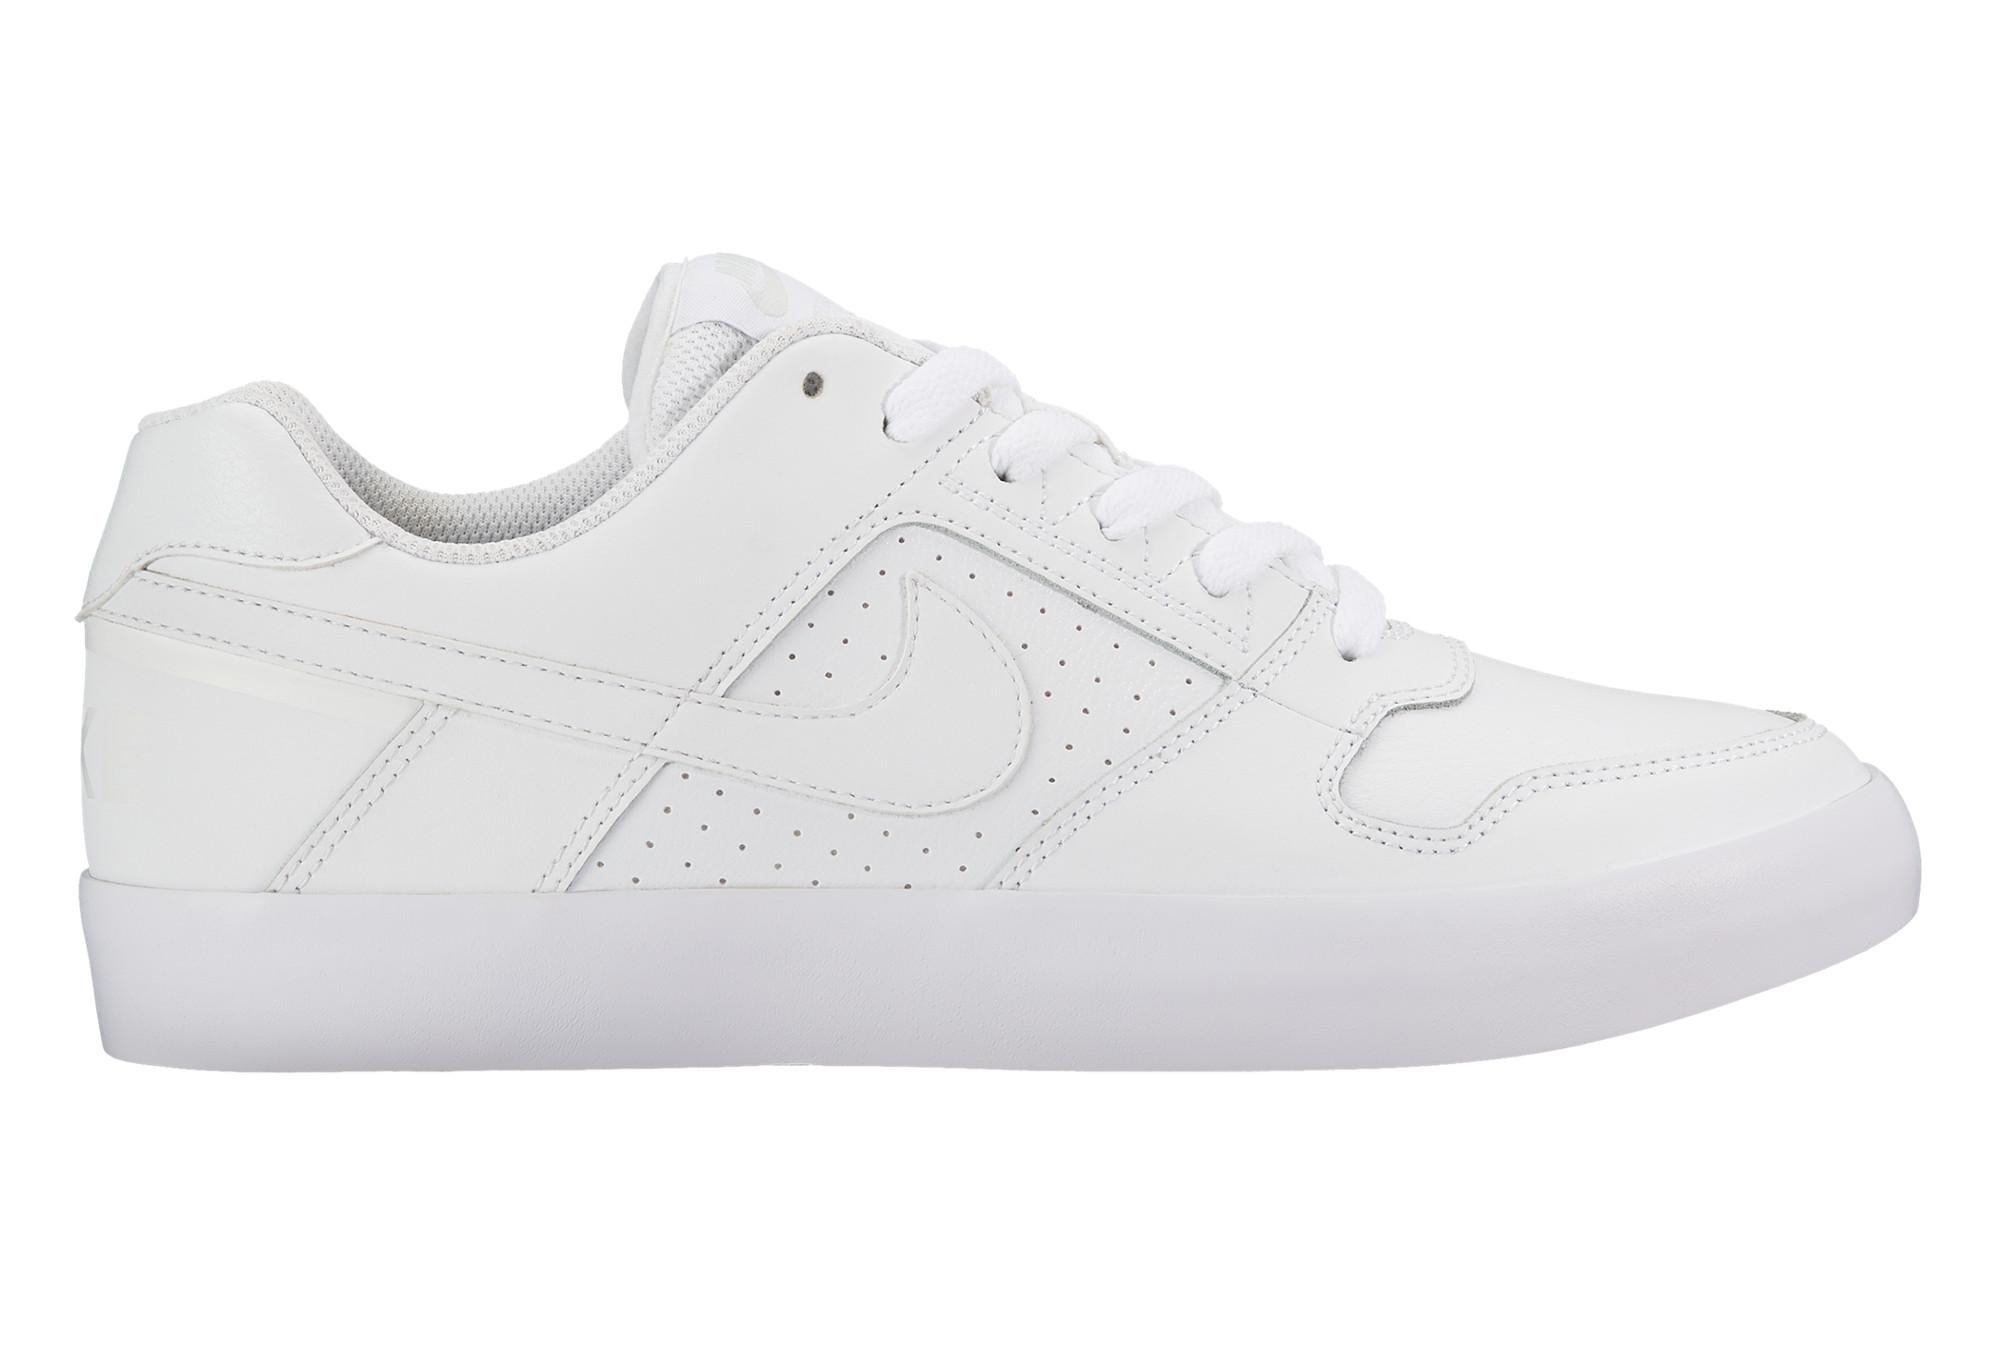 be8c172eda87d Zapatillas Nike SB Delta Force Vulc blancas